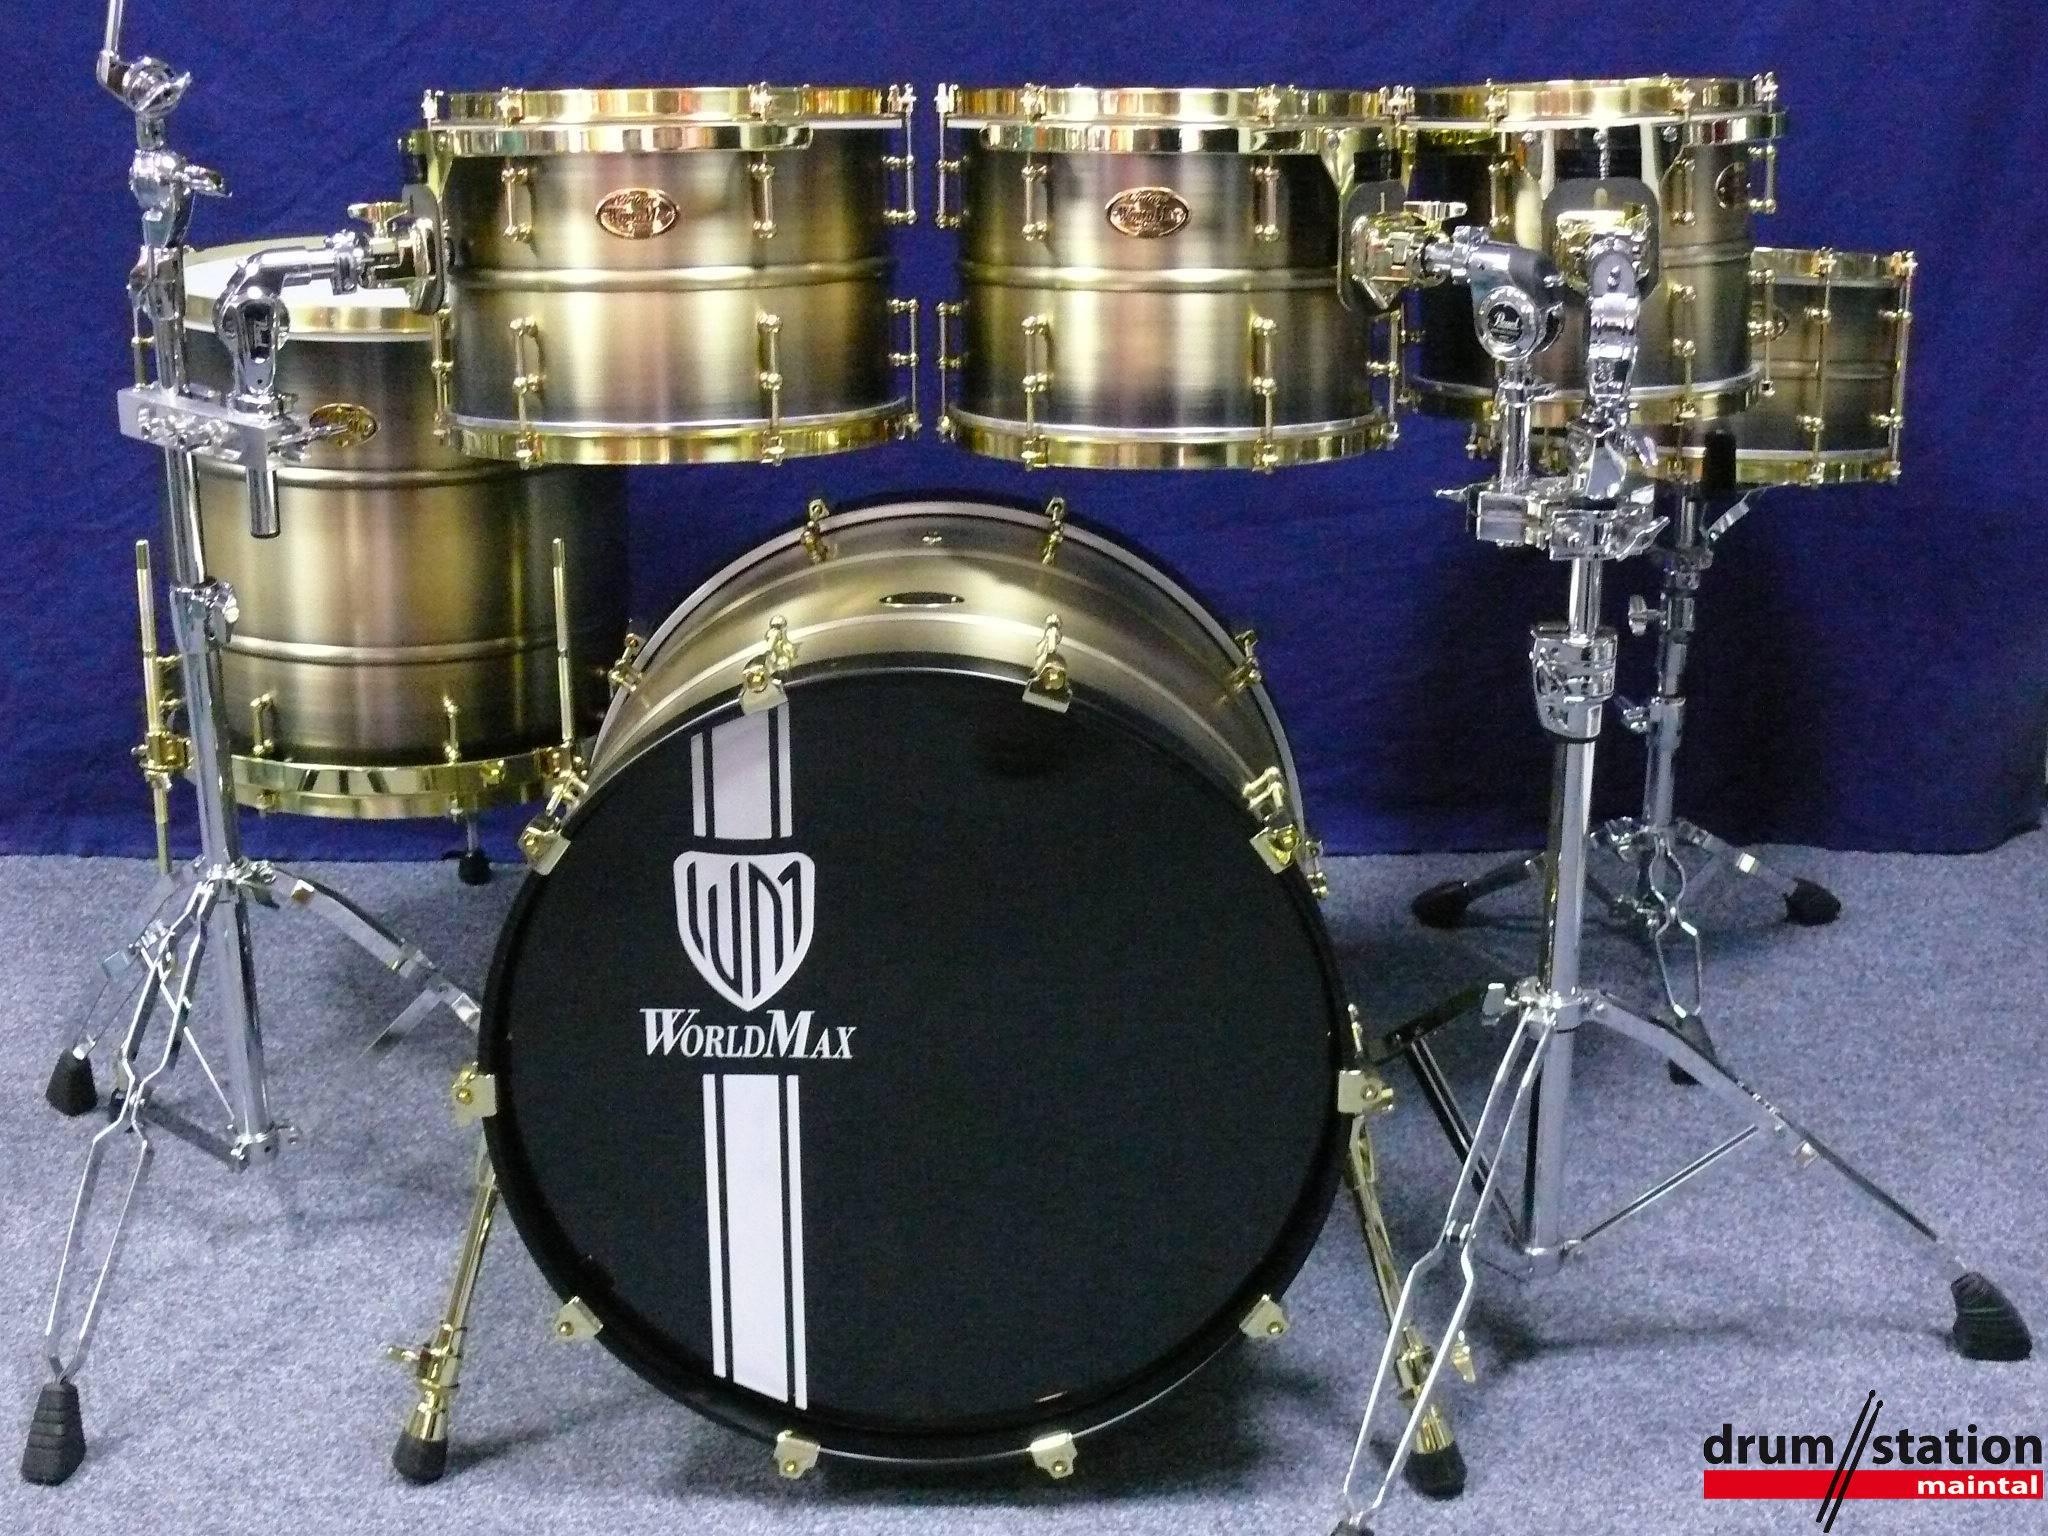 Worldmax brass kit